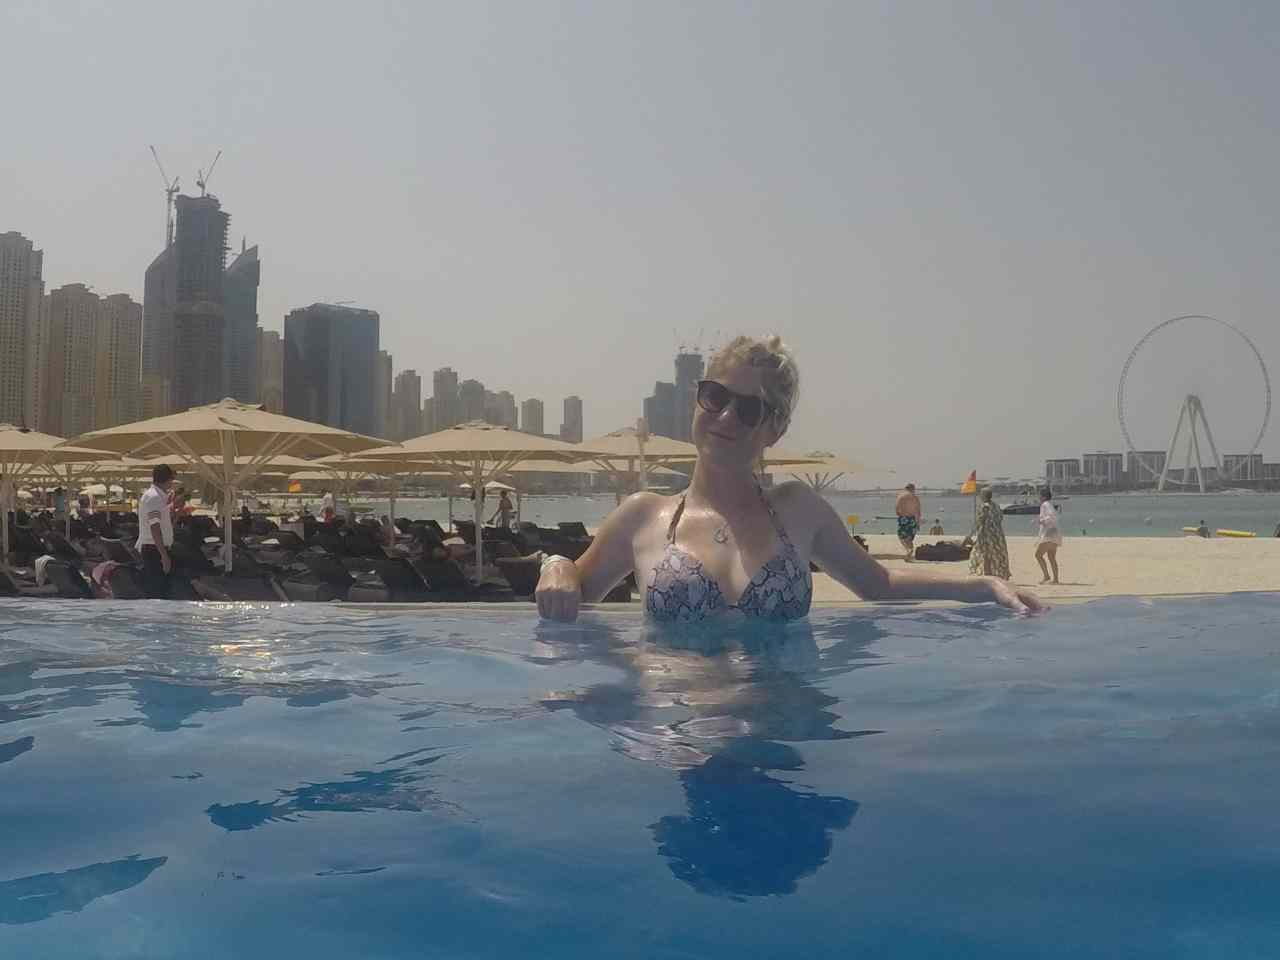 Infinity pool zero gravity Dubai